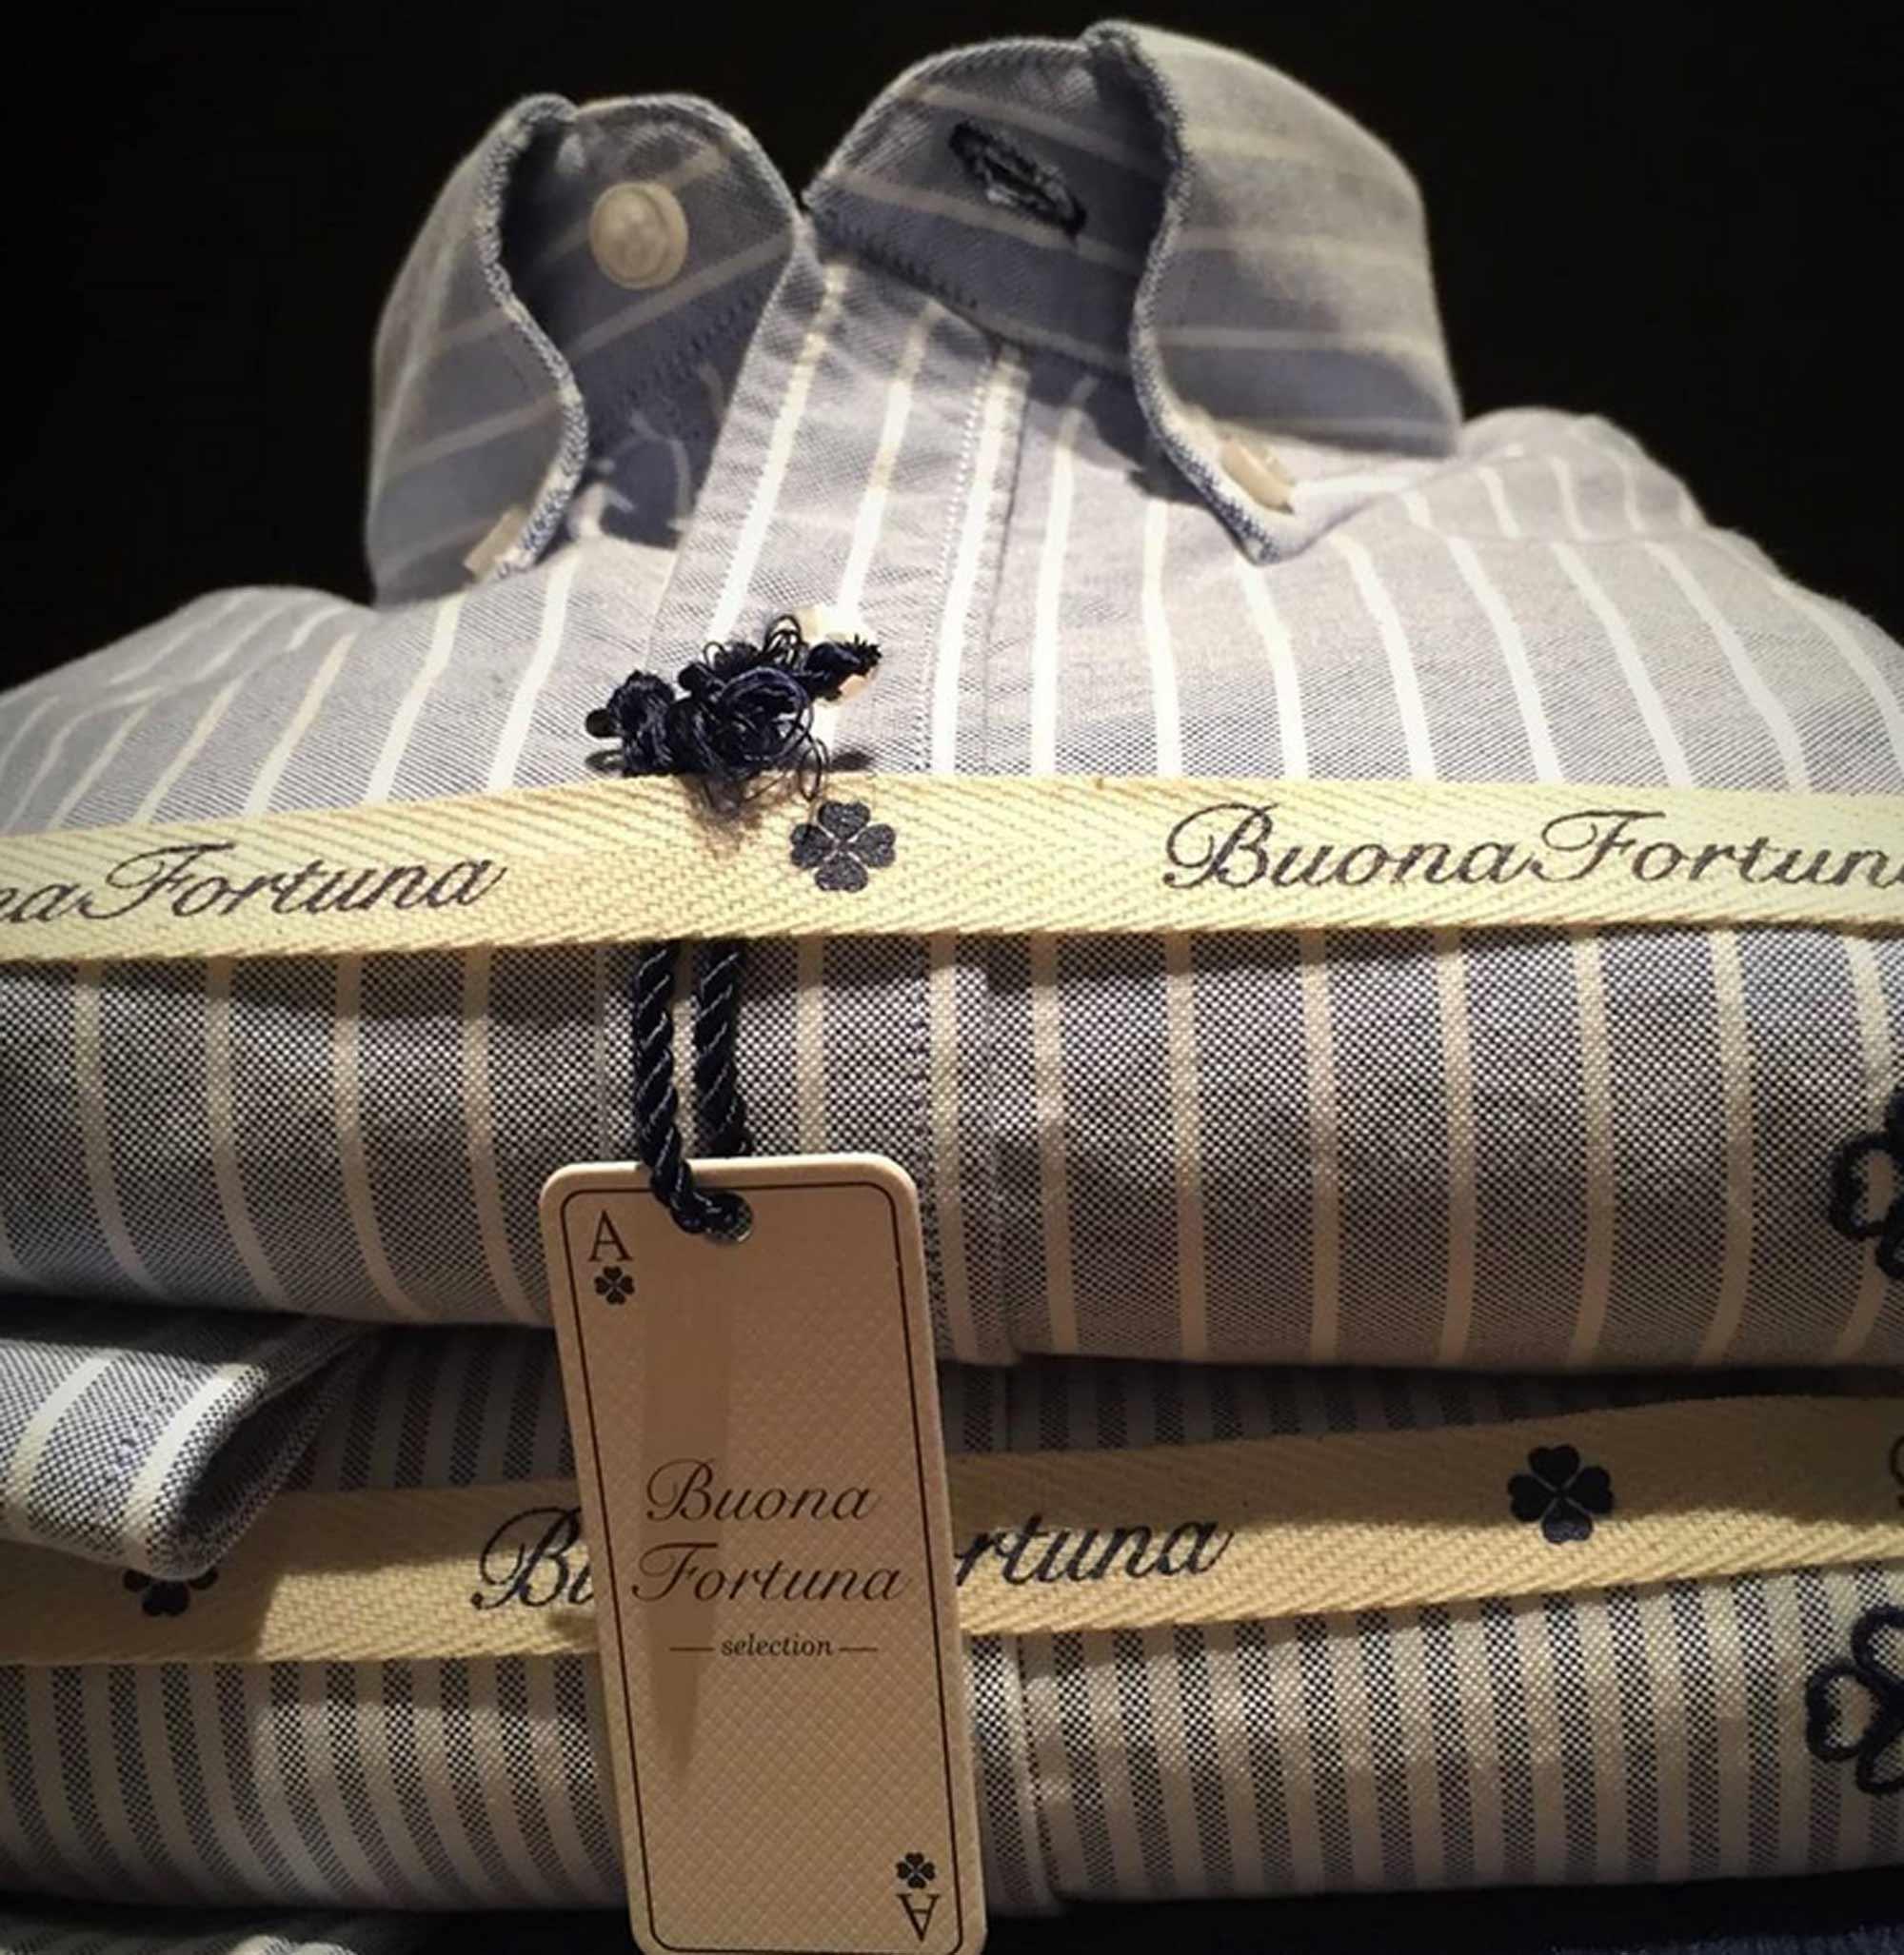 camisas corbatas jerseis pashminas pochettes zapatos exclusivos buona fortuna comprar online moda italiana siete pliegues